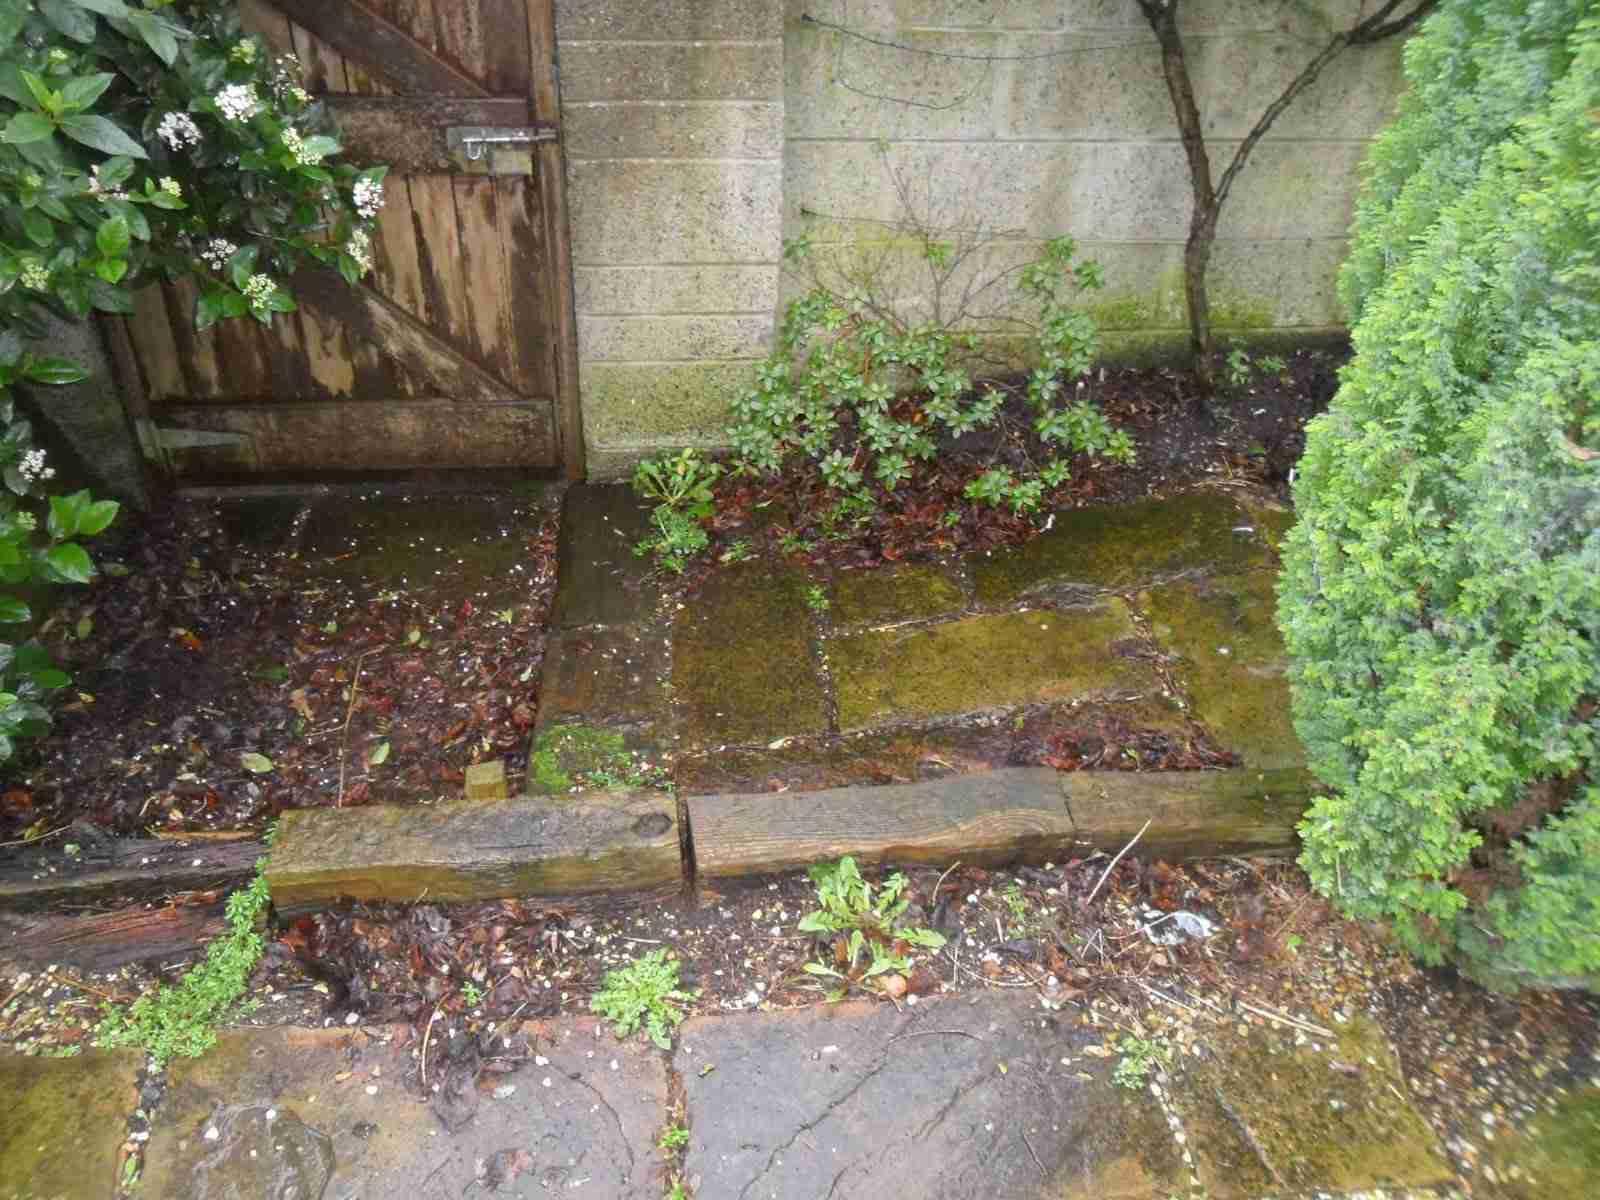 Garden redesign with sandstone patio turf lawn raised for Garden redesign